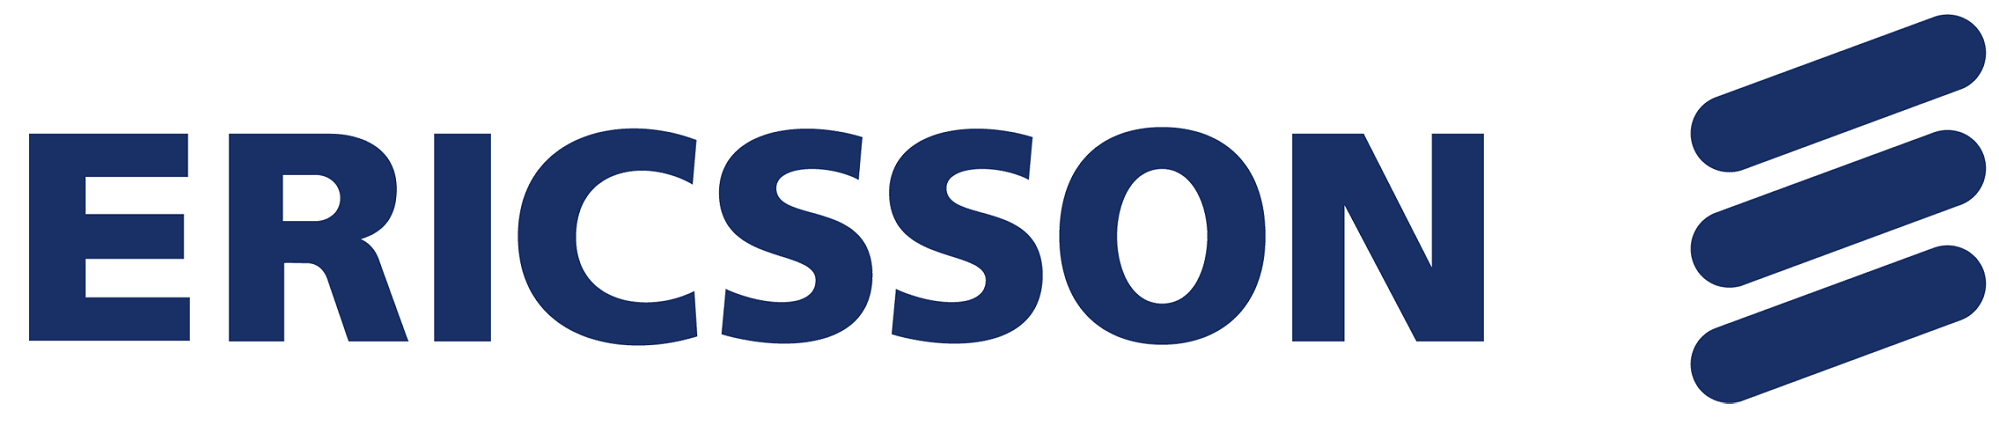 Ericsson-logo-blue_1